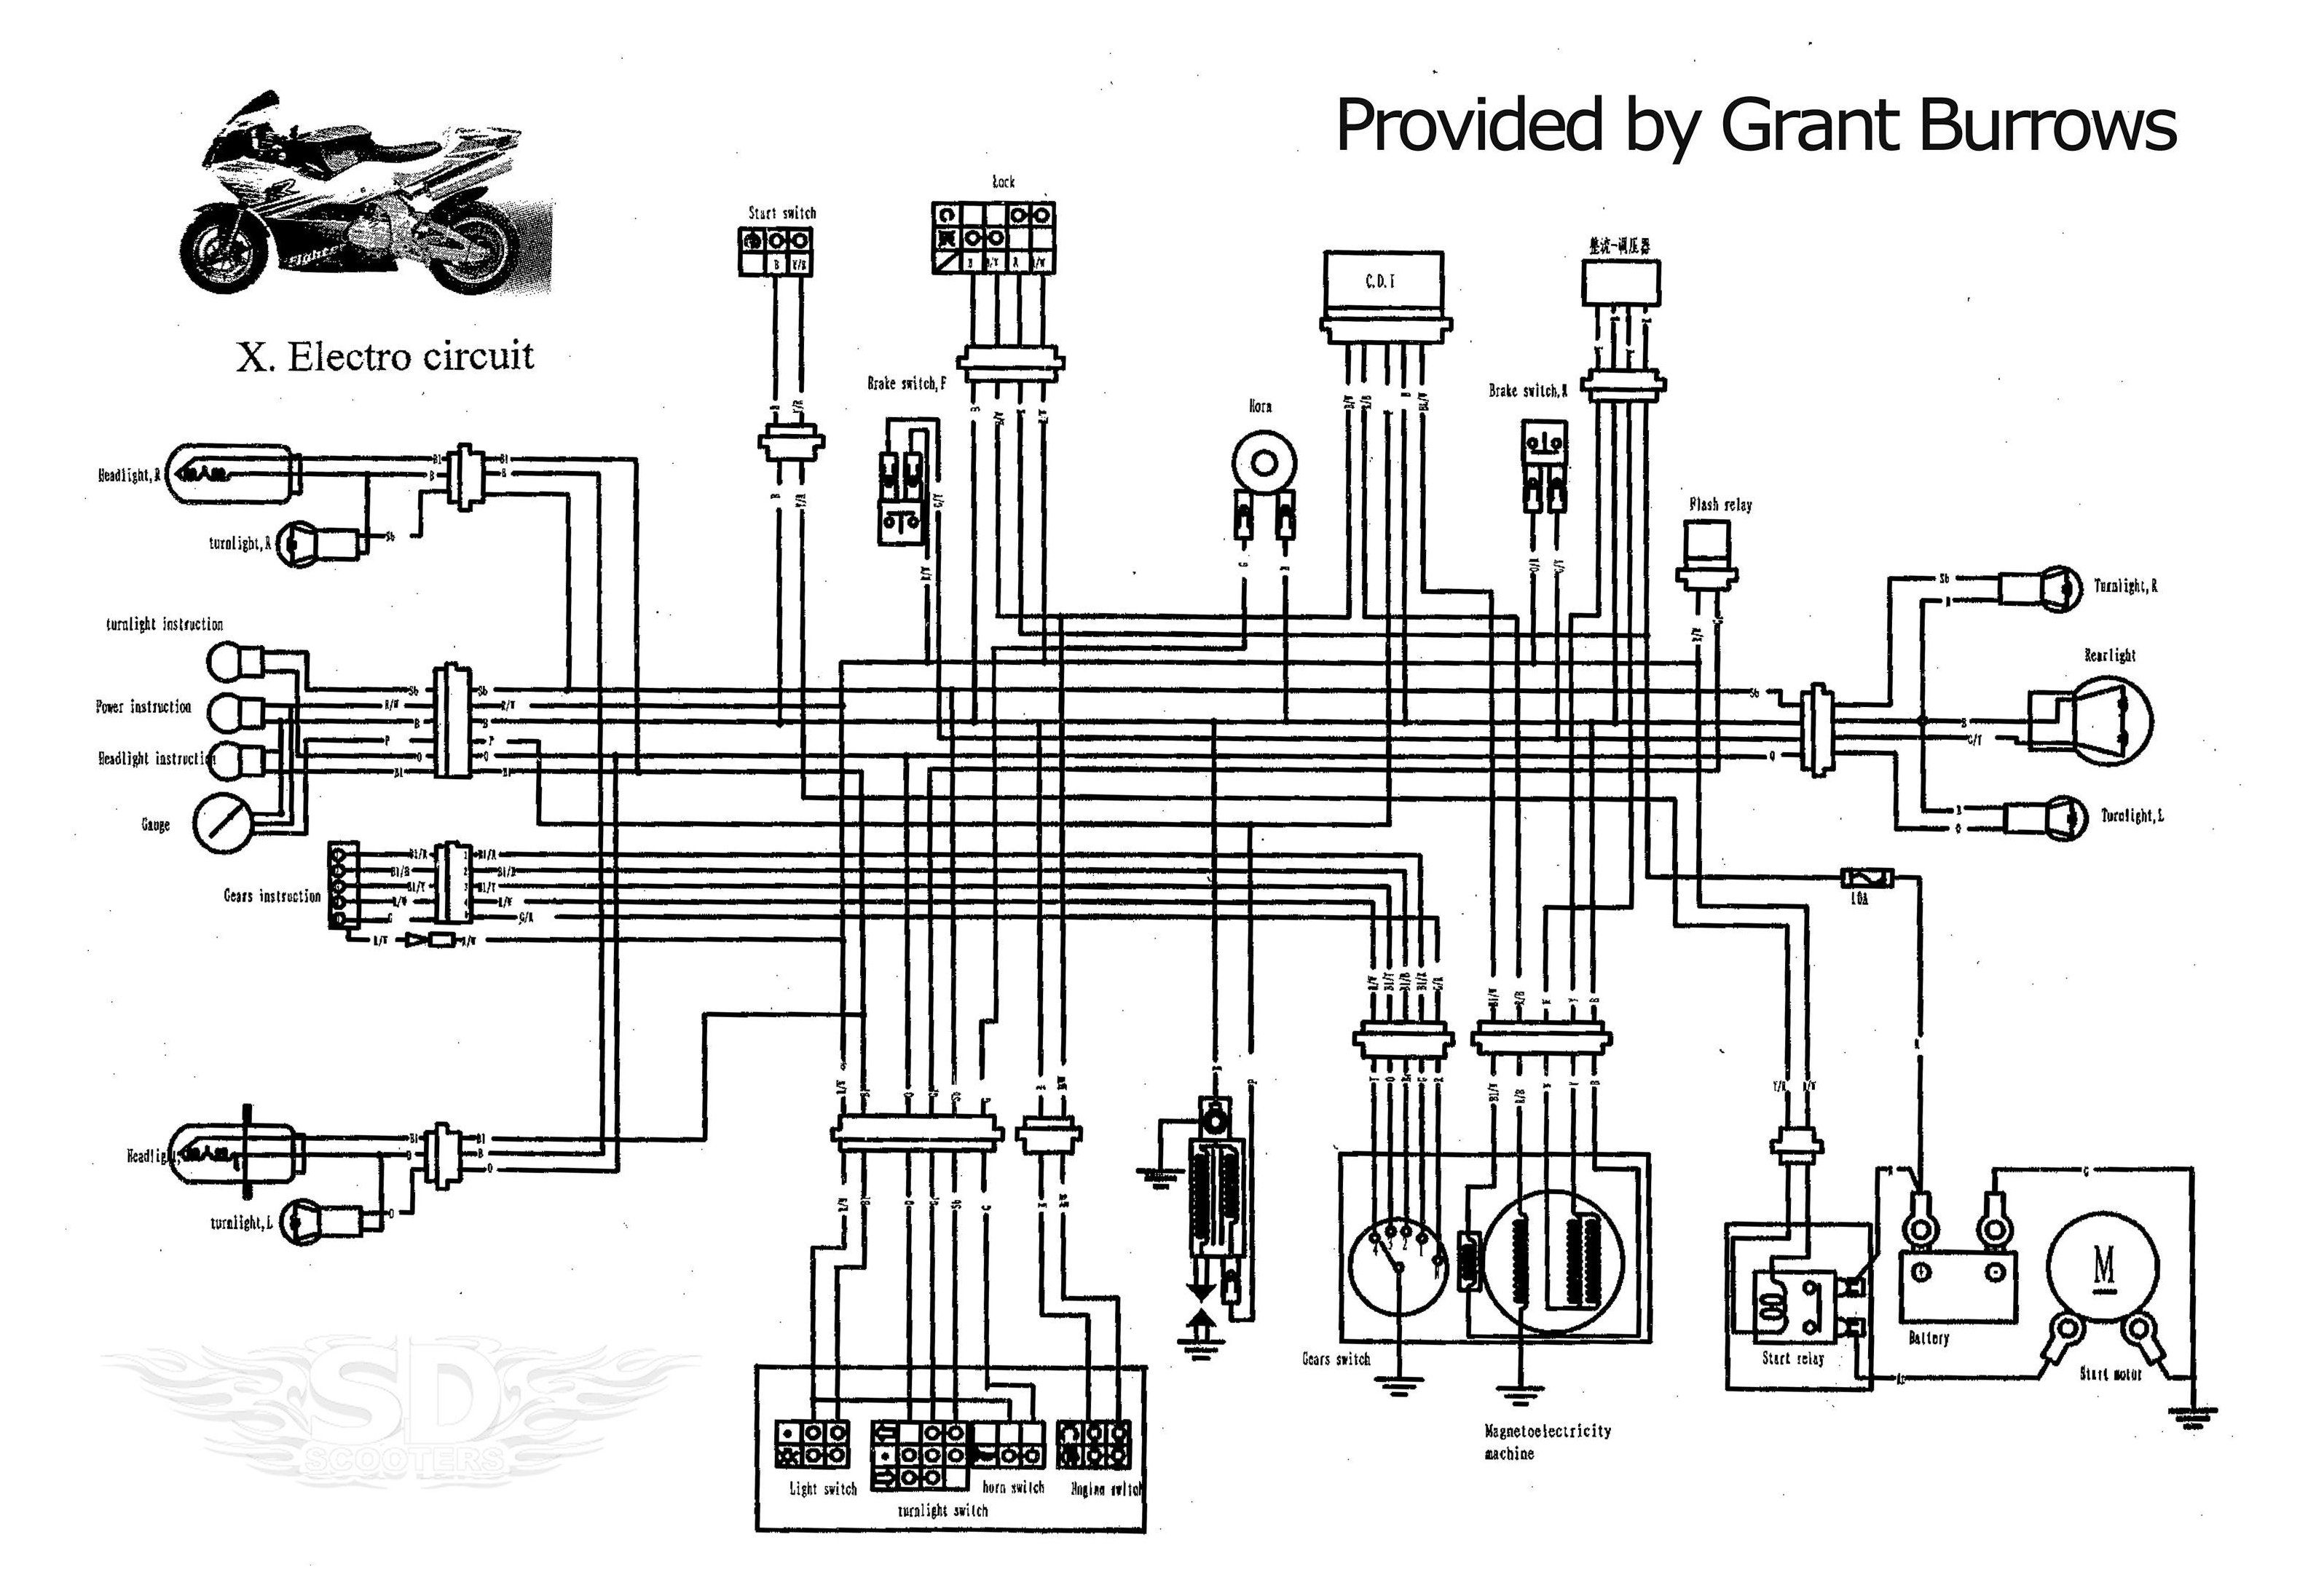 49cc Pocket Bike Engine Diagram #x1 #pocket #bike #x1pocketbike | Pocket  bike, Diagram, Bike engine | X1 Pocket Bike Wiring Diagram |  | Pinterest